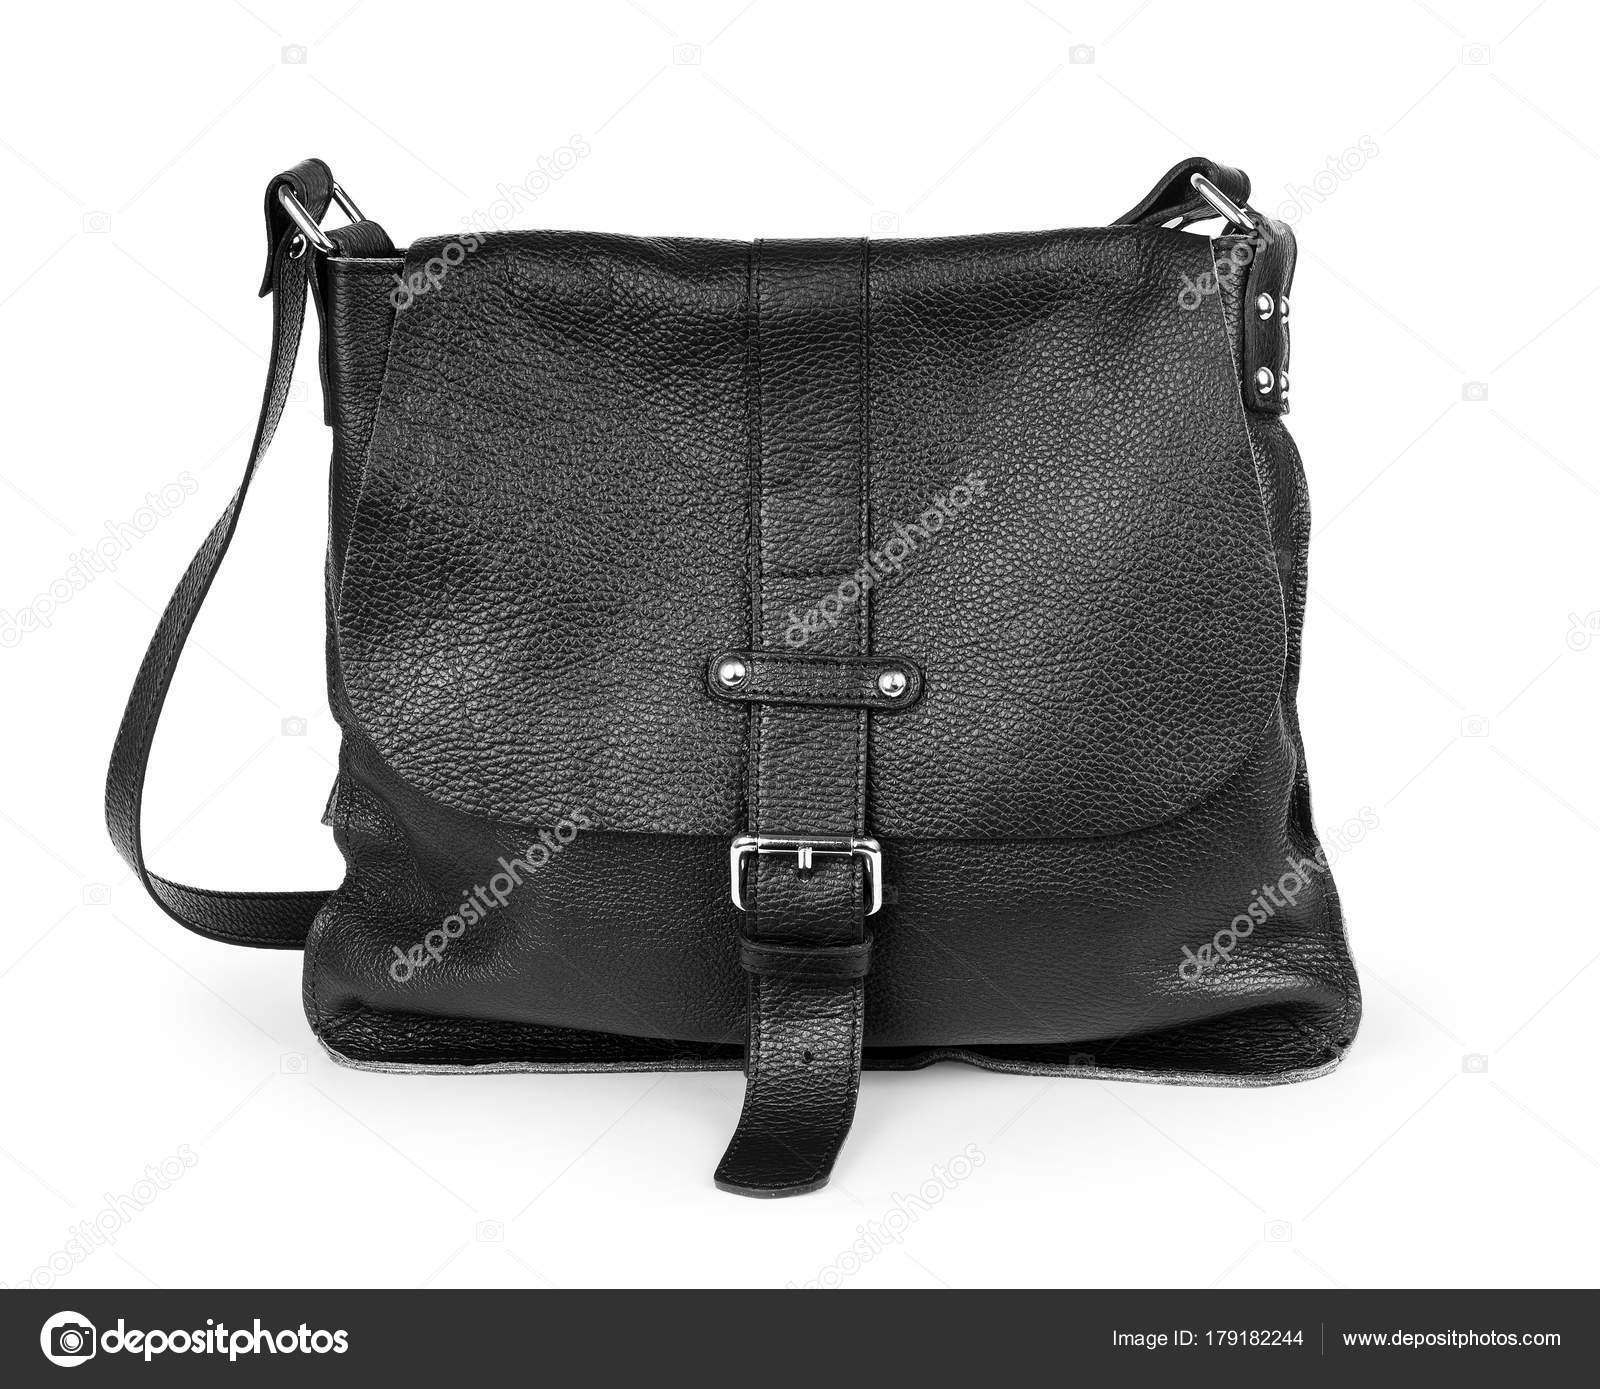 1fadf89d55 Μαύρη δερμάτινη τσάντα γυναίκες που απομονώνονται σε λευκό φόντο — Εικόνα  από Vadarshop